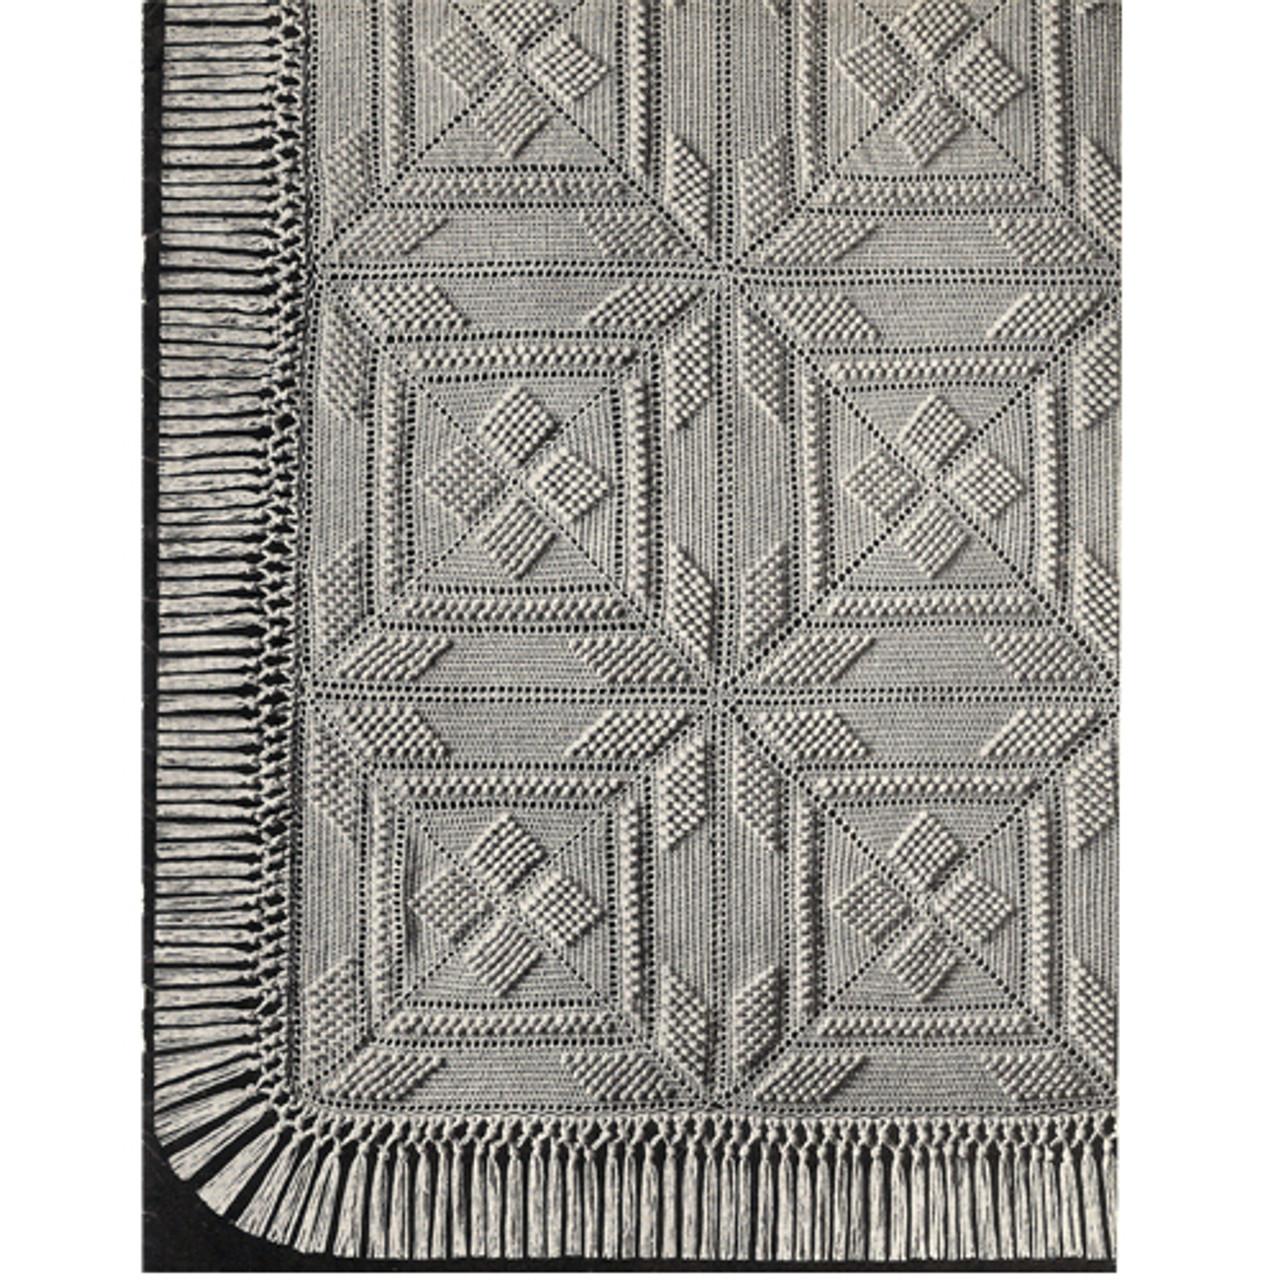 Crochet Bedspread Pattern, Popcorn Squares